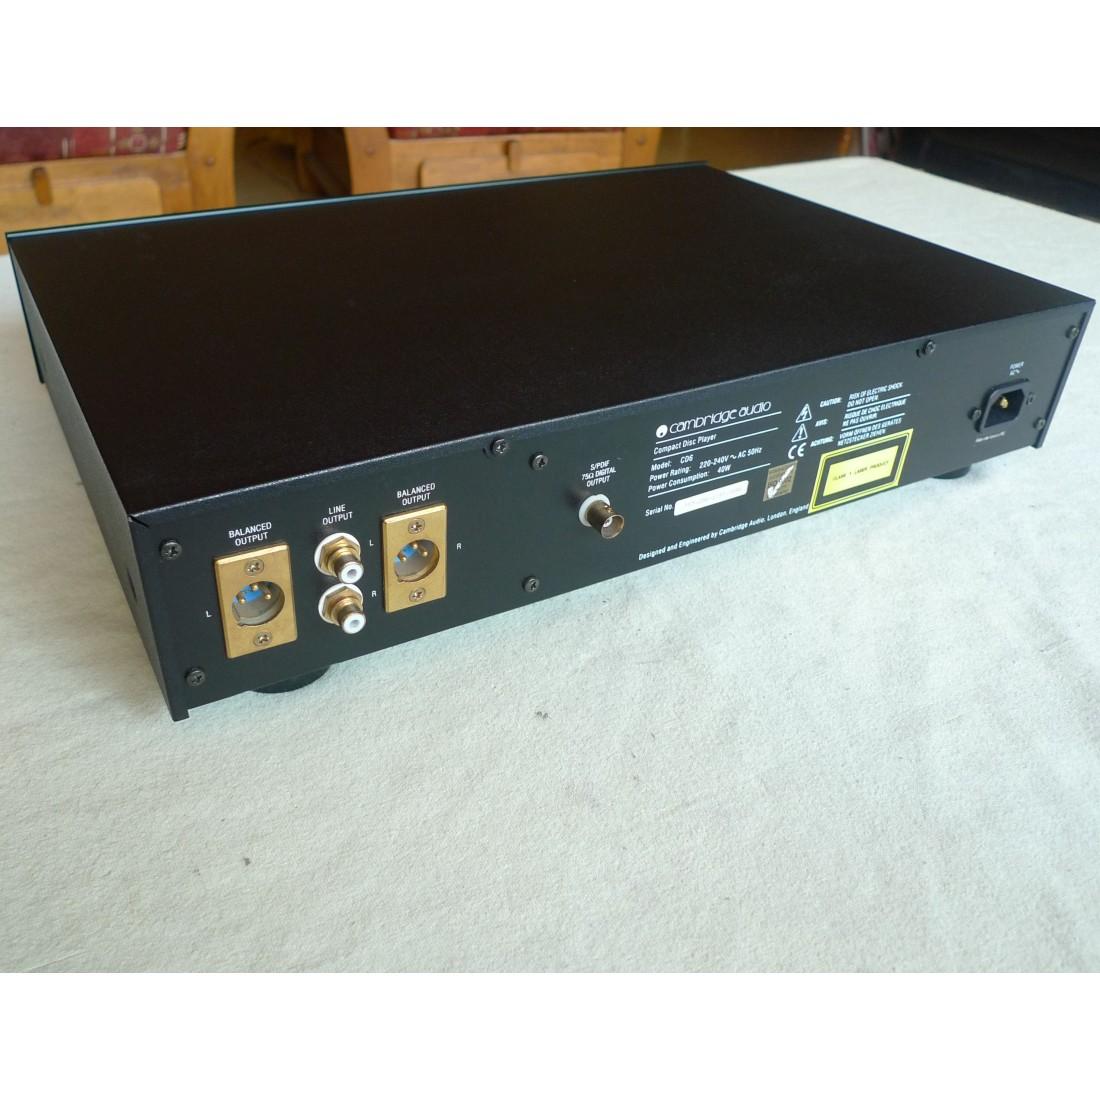 lecteur cd hifi audiophile cambridge audio cd 6 bitstream. Black Bedroom Furniture Sets. Home Design Ideas